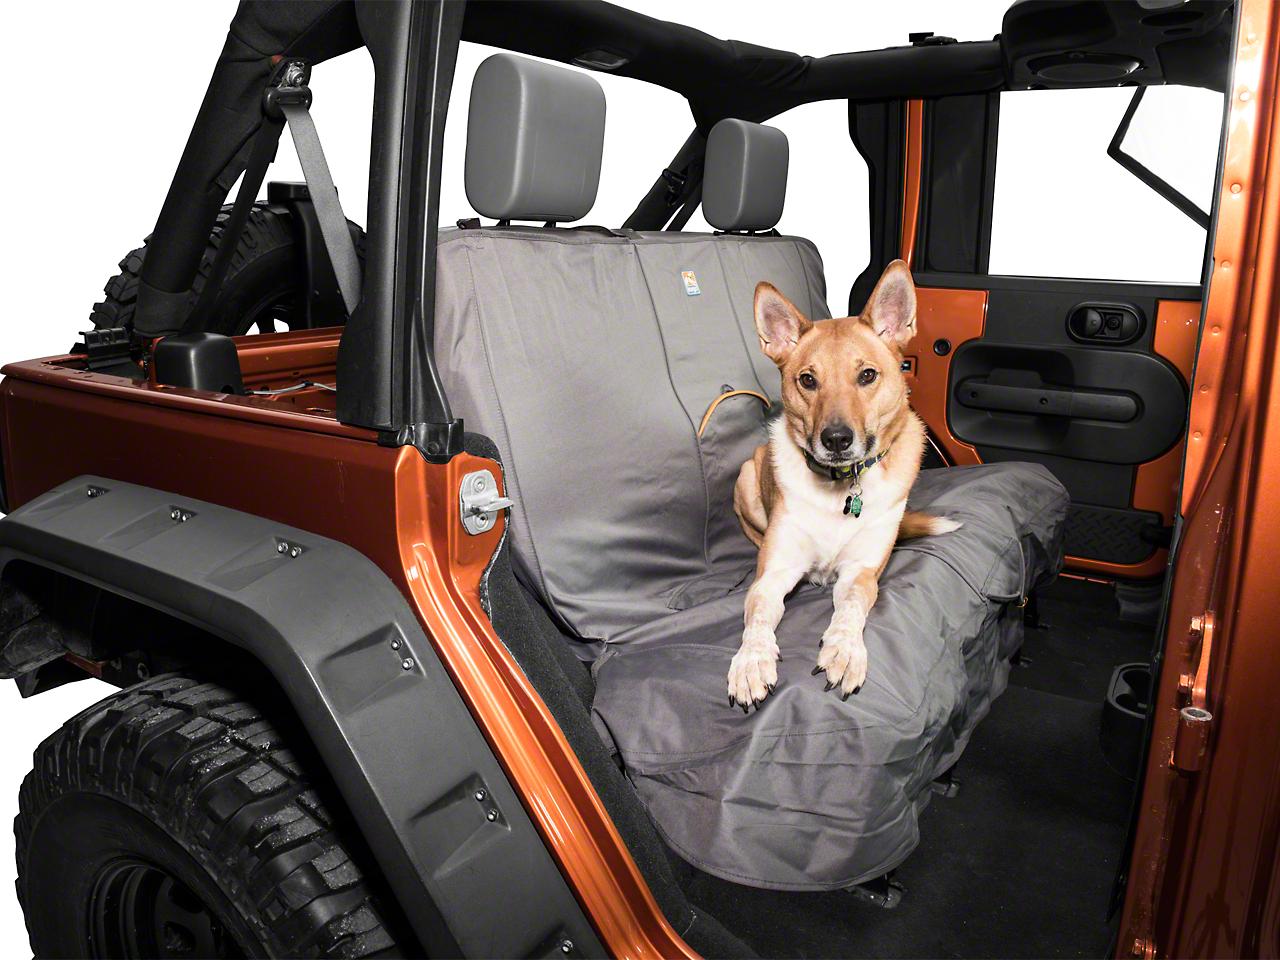 Kurgo Wander Rear Bench Seat Cover - Charcoal (87-18 Wrangler YJ, TJ & JK)